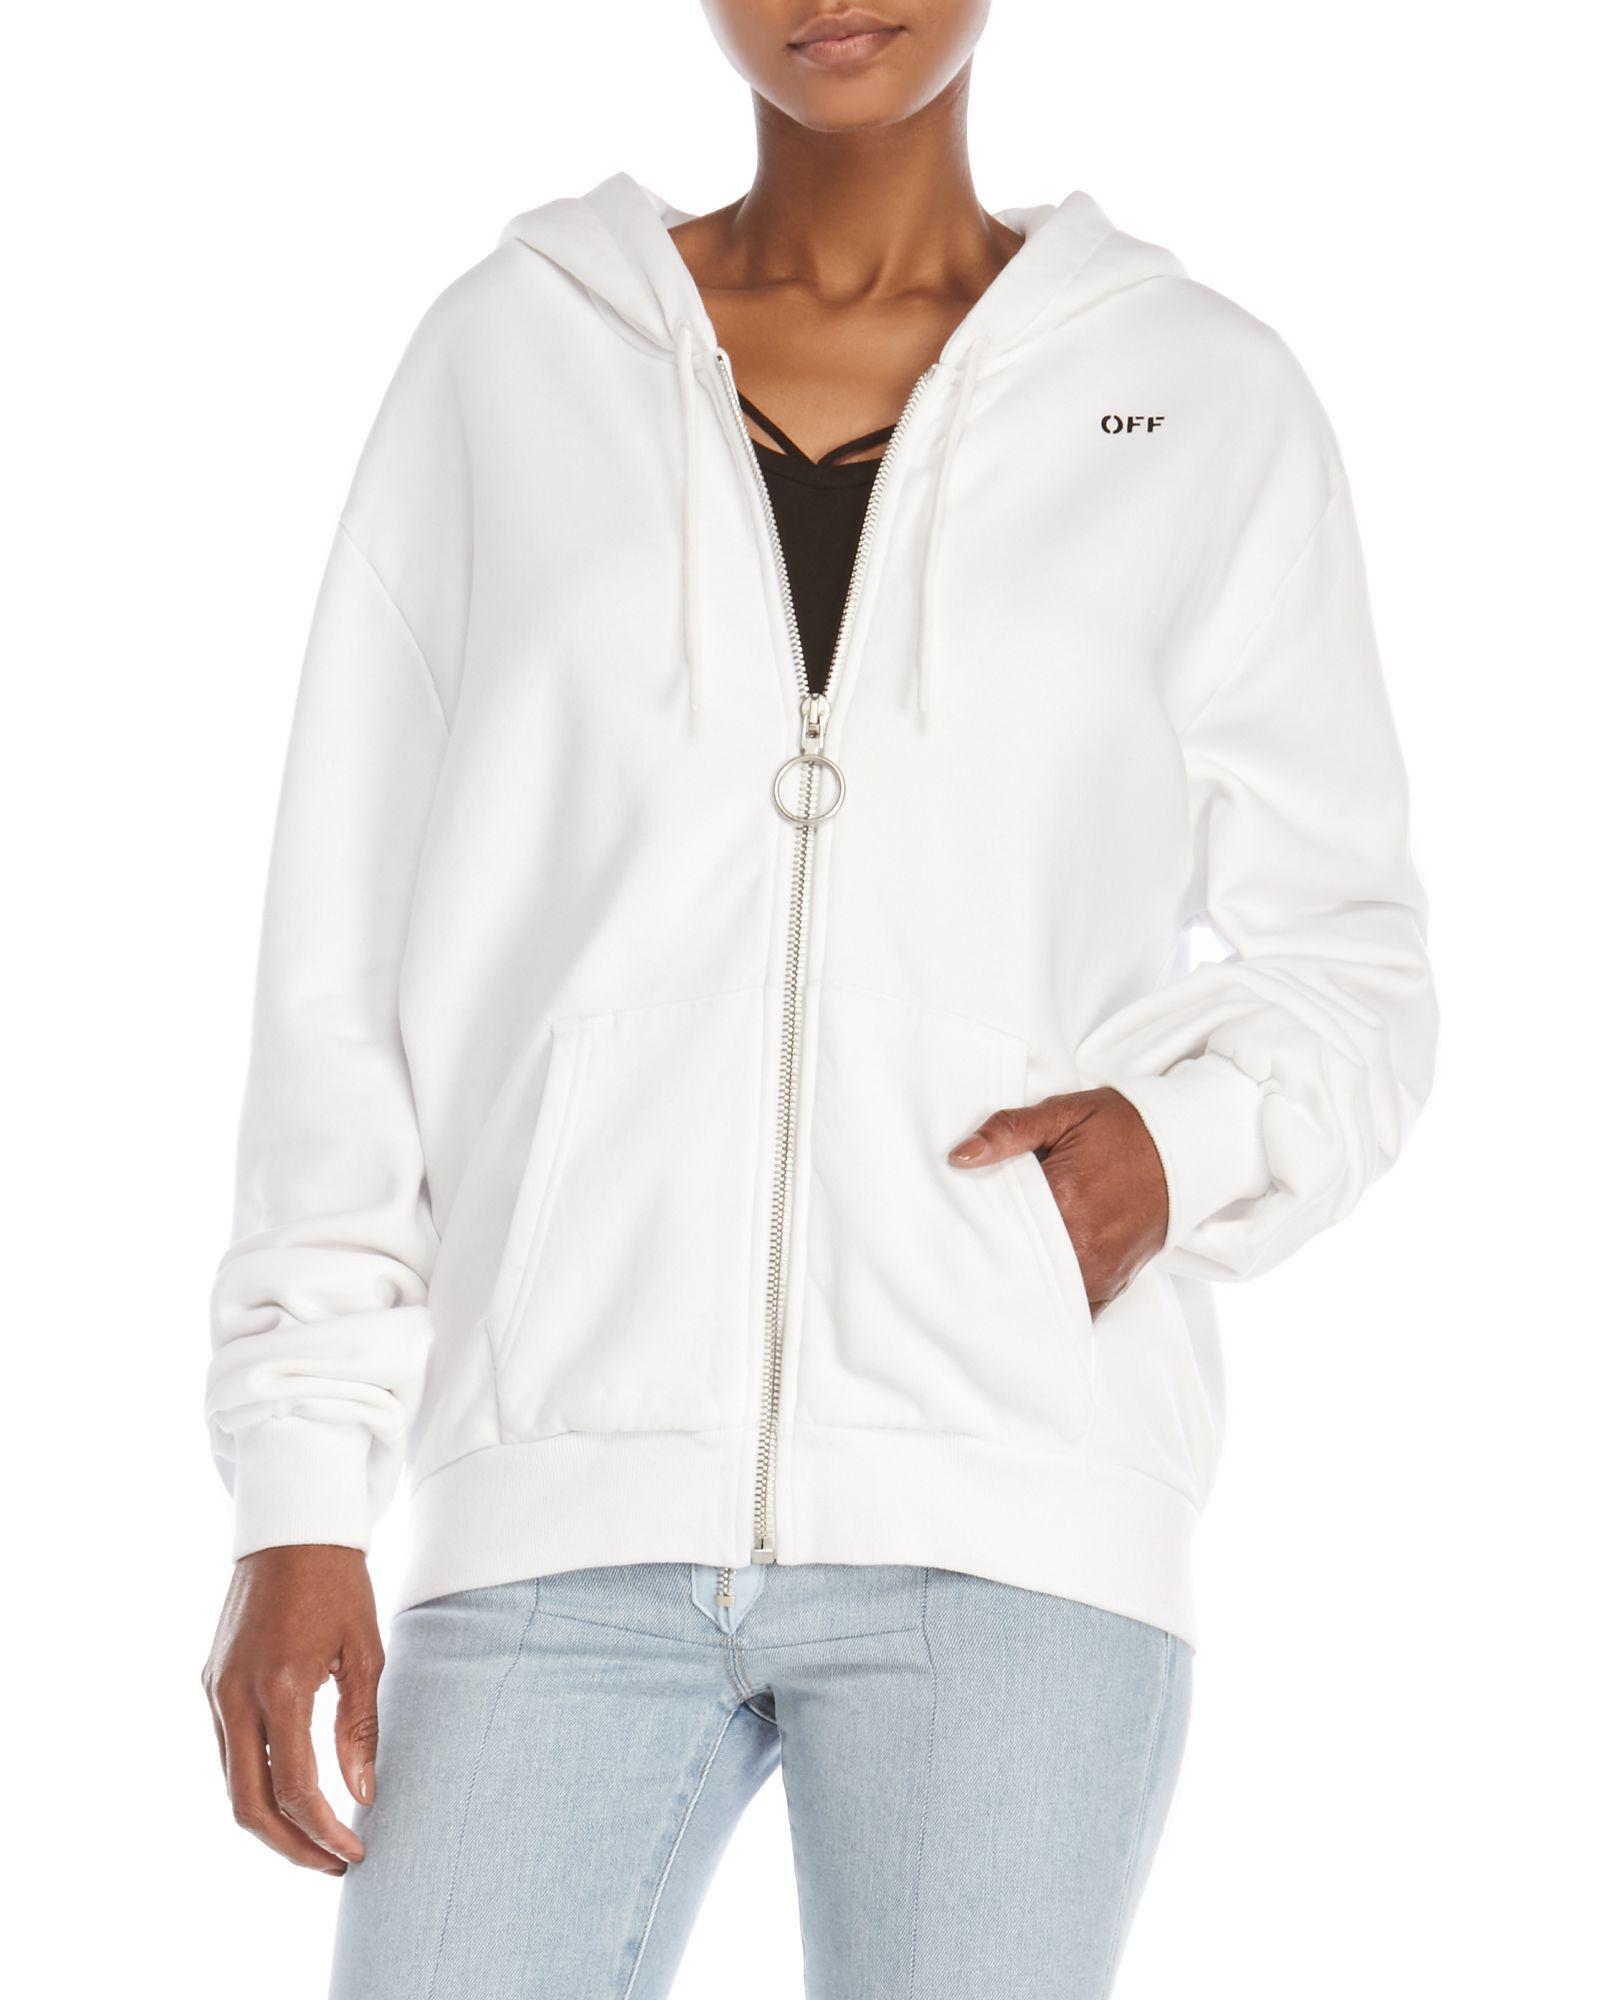 3f460f7db30b Off-White C O Virgil Abloh Oversized Zip-Up Fleece Hoodie